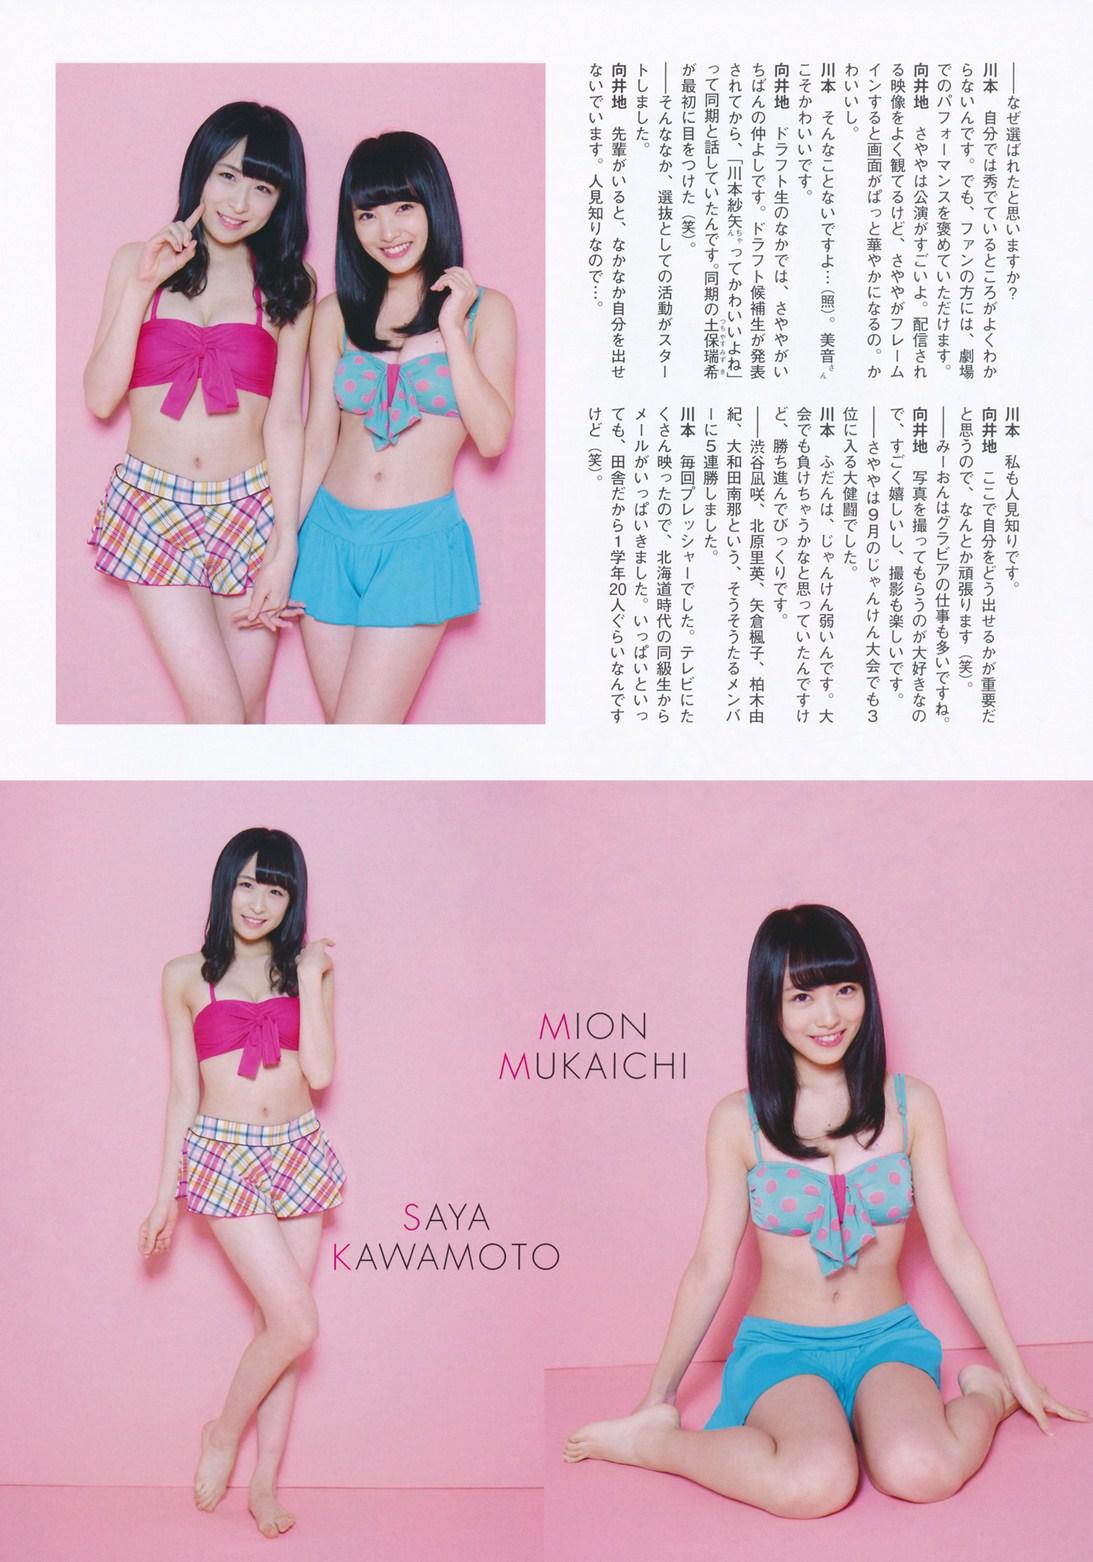 Kawamoto Saya 川本紗矢, Mukaichi Mion 向井地美音 AKB48, Flash Special Best Gravure Autumn 2014